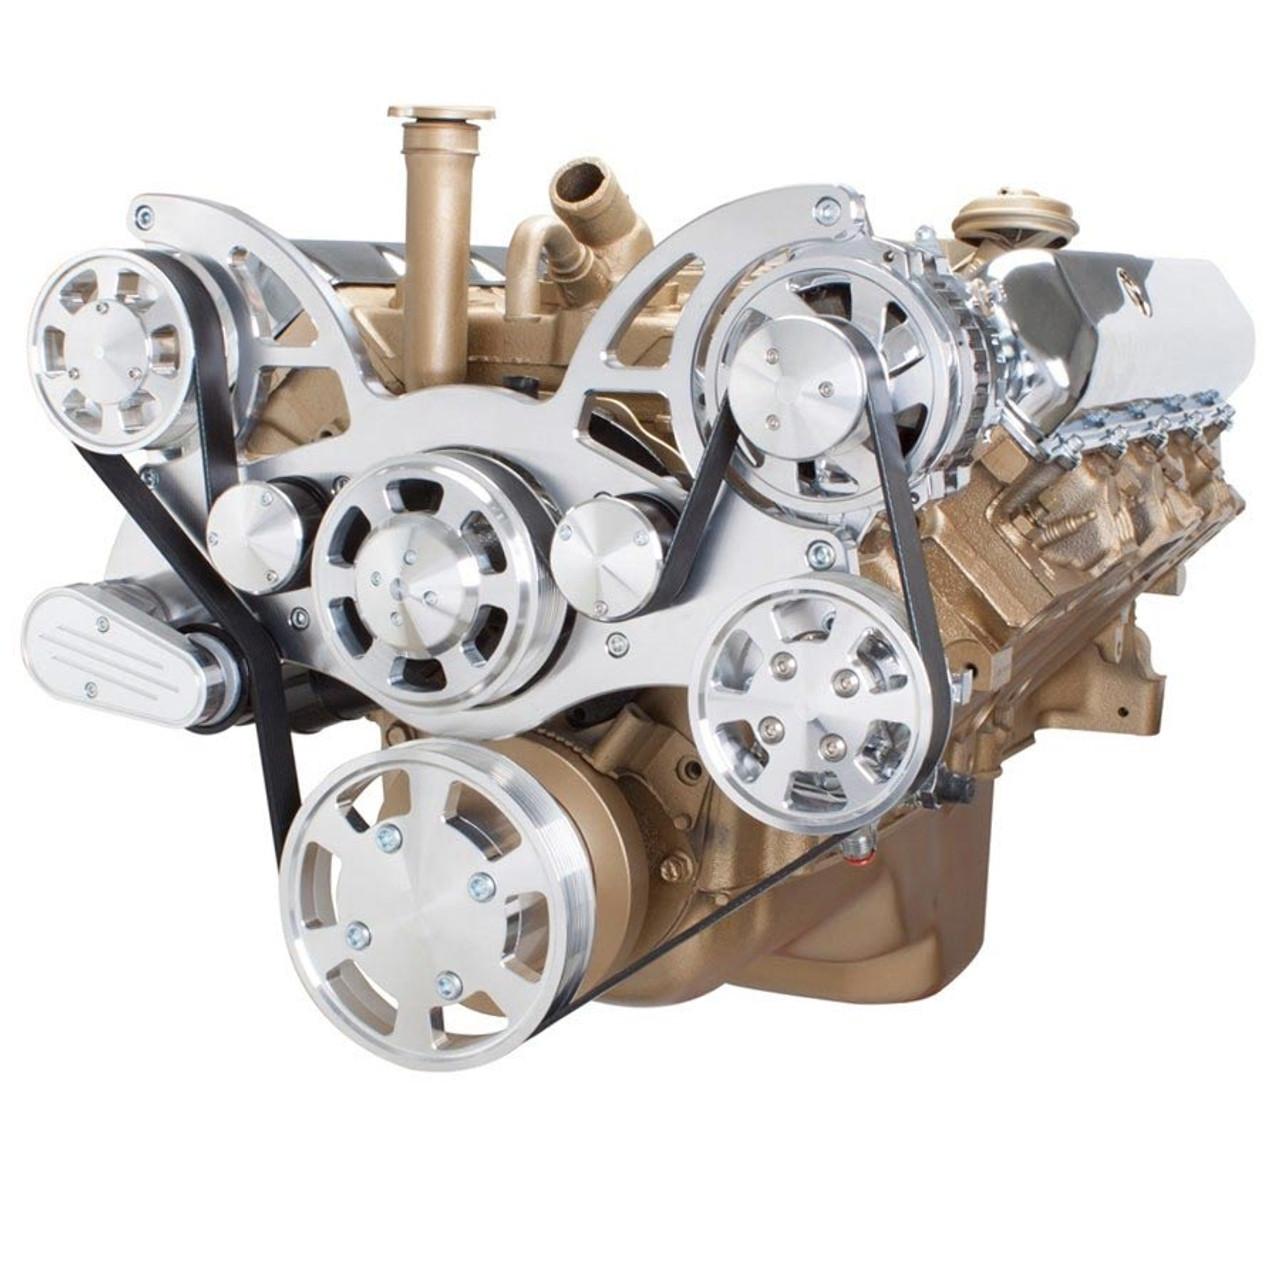 medium resolution of serpentine system for oldsmobile 350 455 power steering alternator